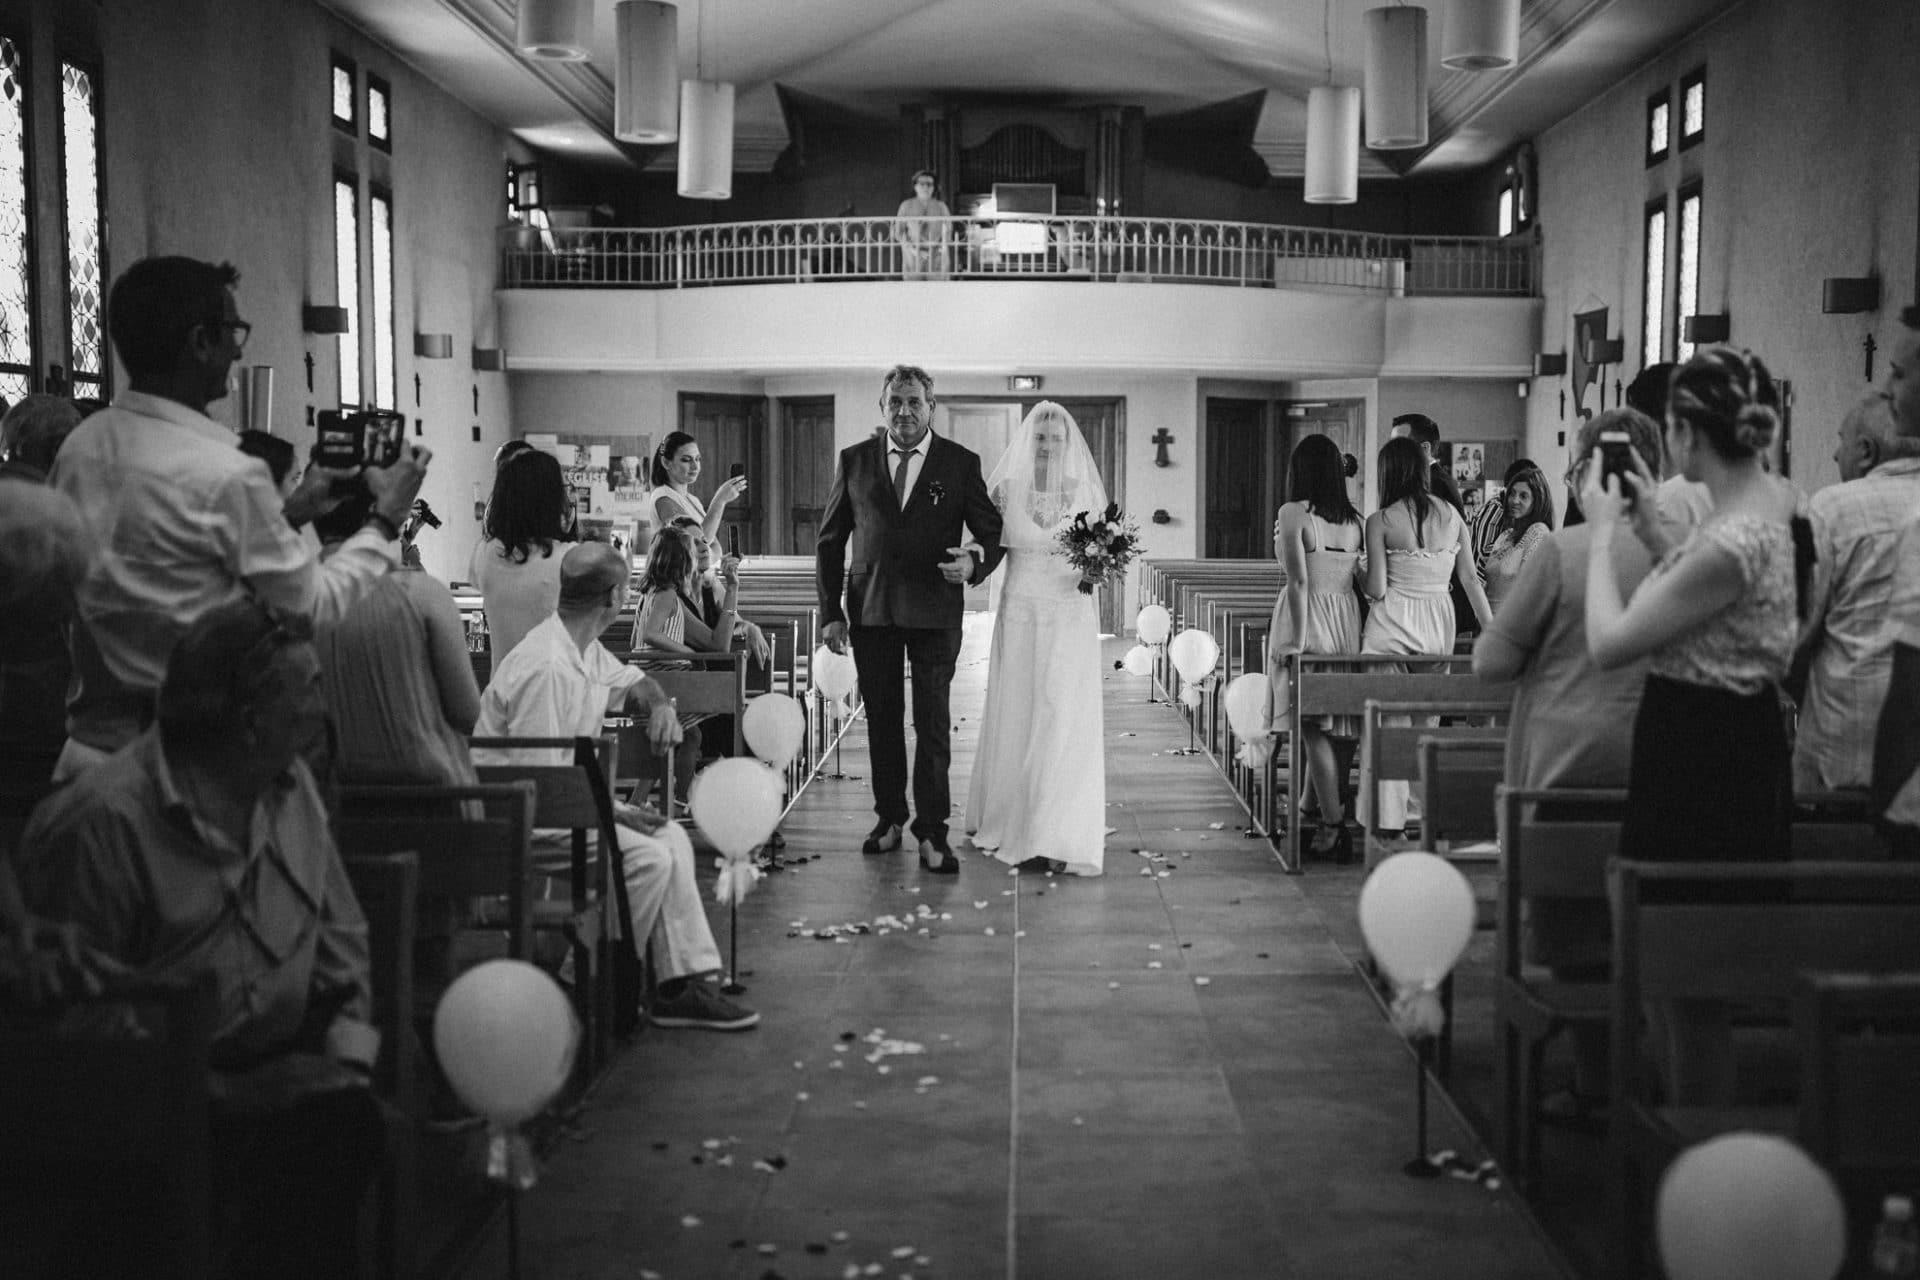 church bride and father wedding destination wedding photographer paris france